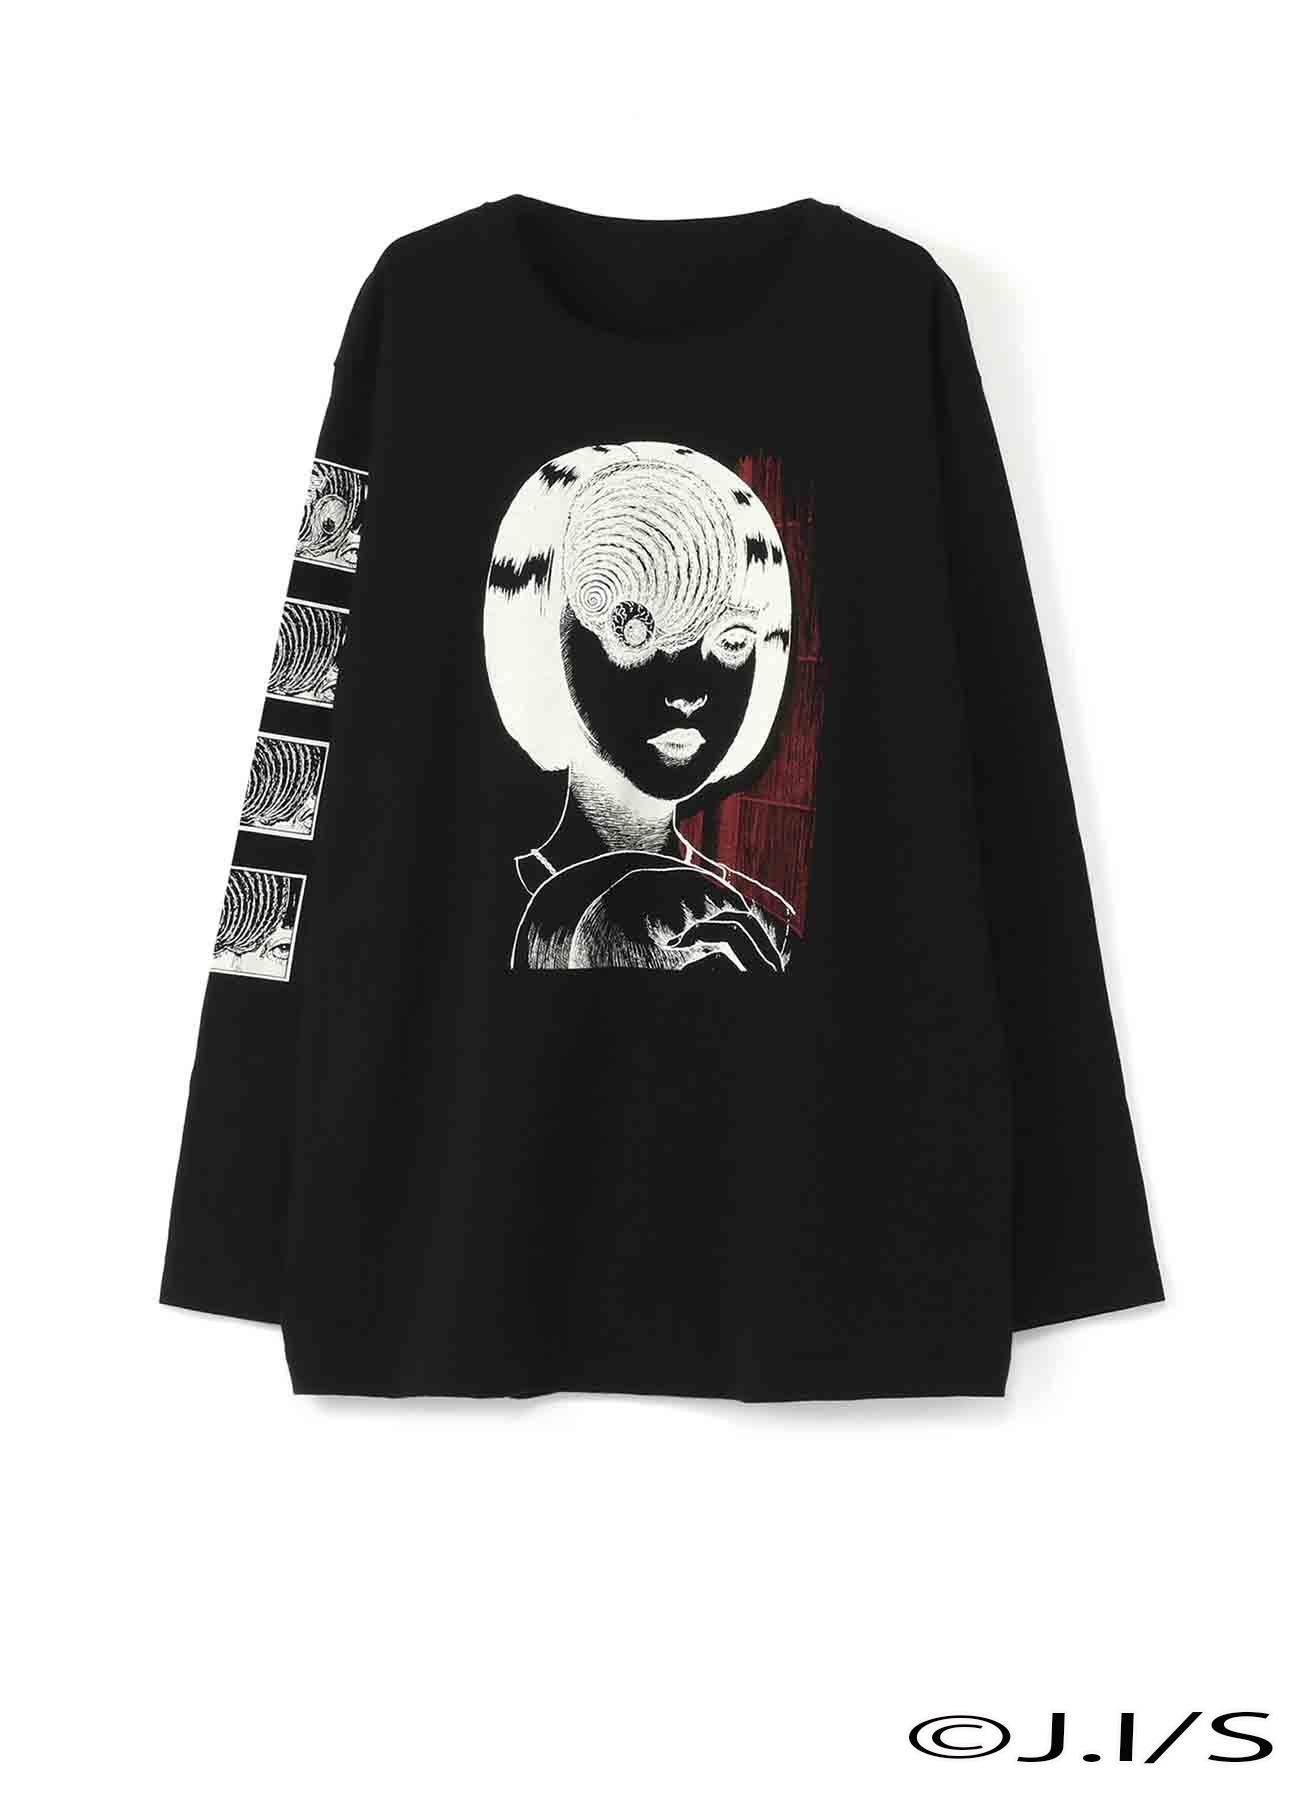 20/CottonJersey Uzumaki Azami on the Forehead LongSleeveTshirt